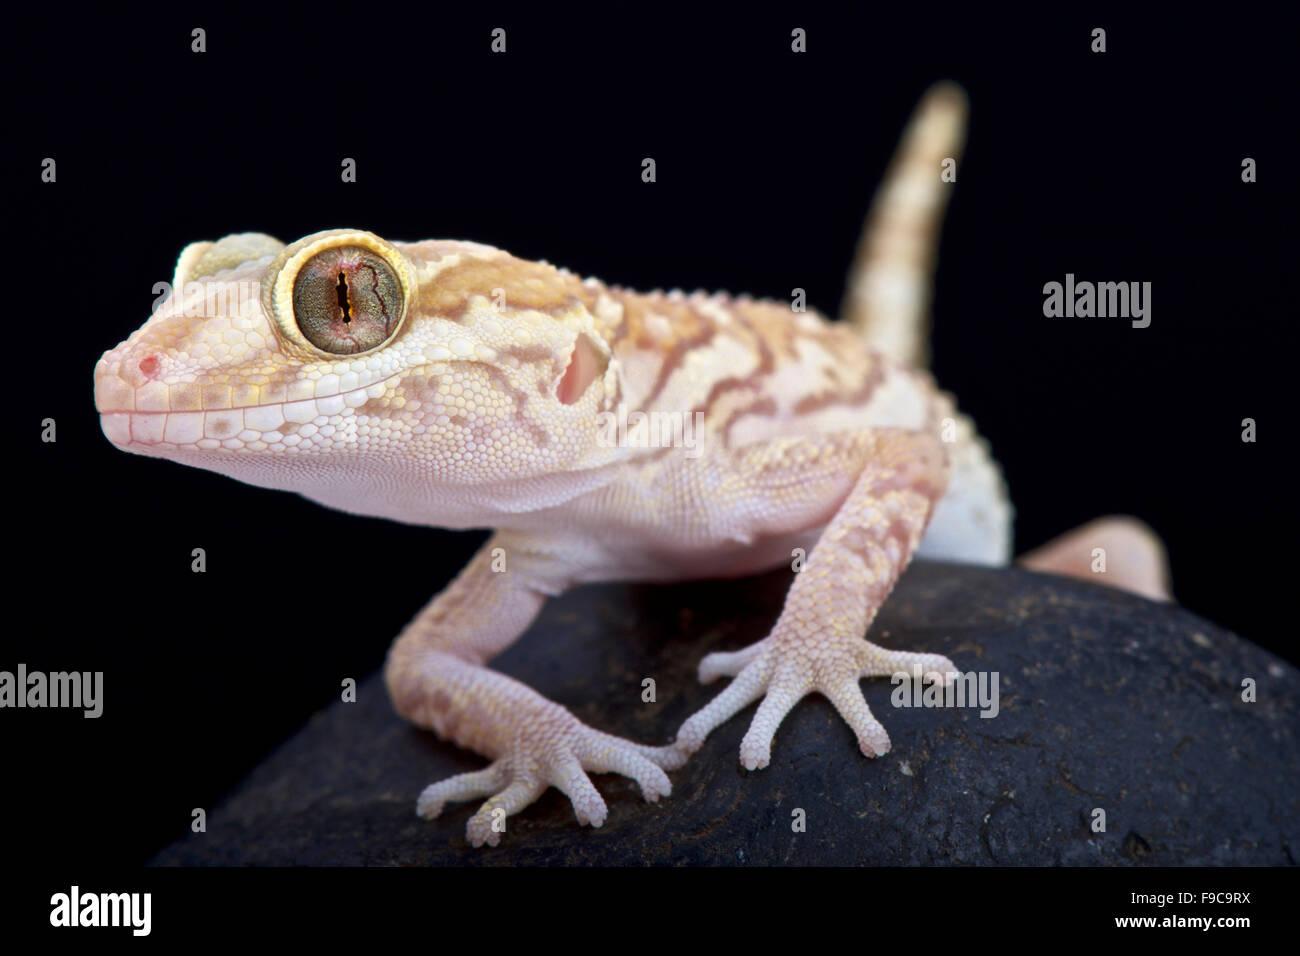 Ocelot gecko (Paroedura pictus) - Stock Image